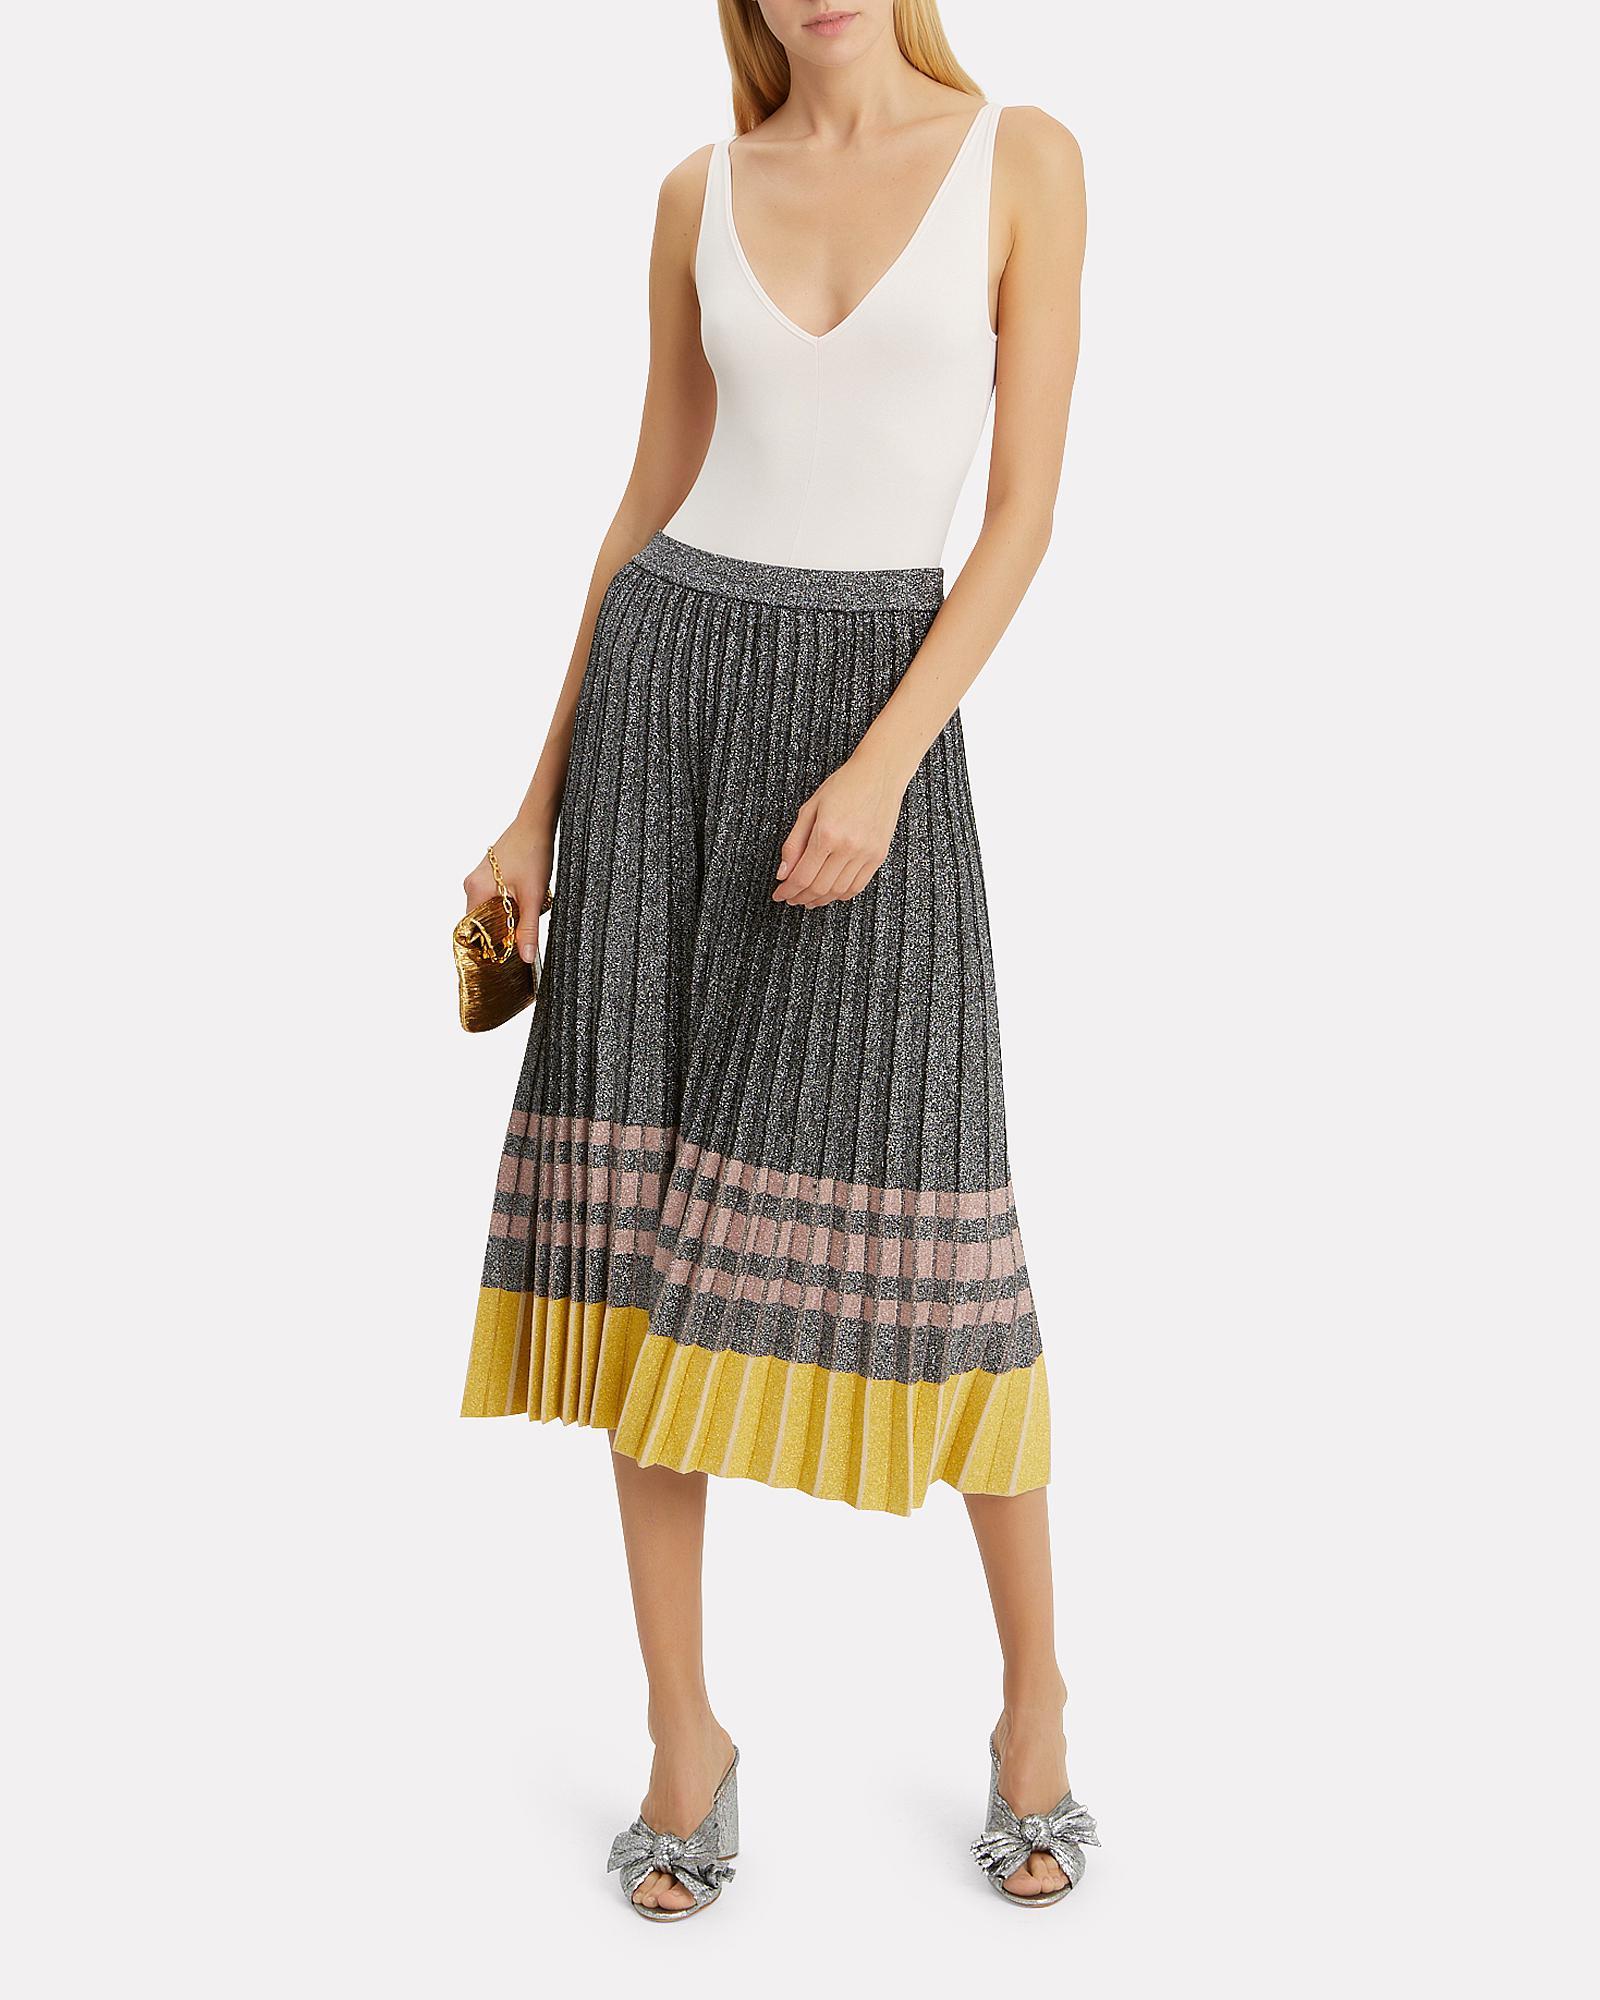 6edf07fdd5 10 Crosby Derek Lam Pleated Lurex Knit Skirt in Metallic - Lyst